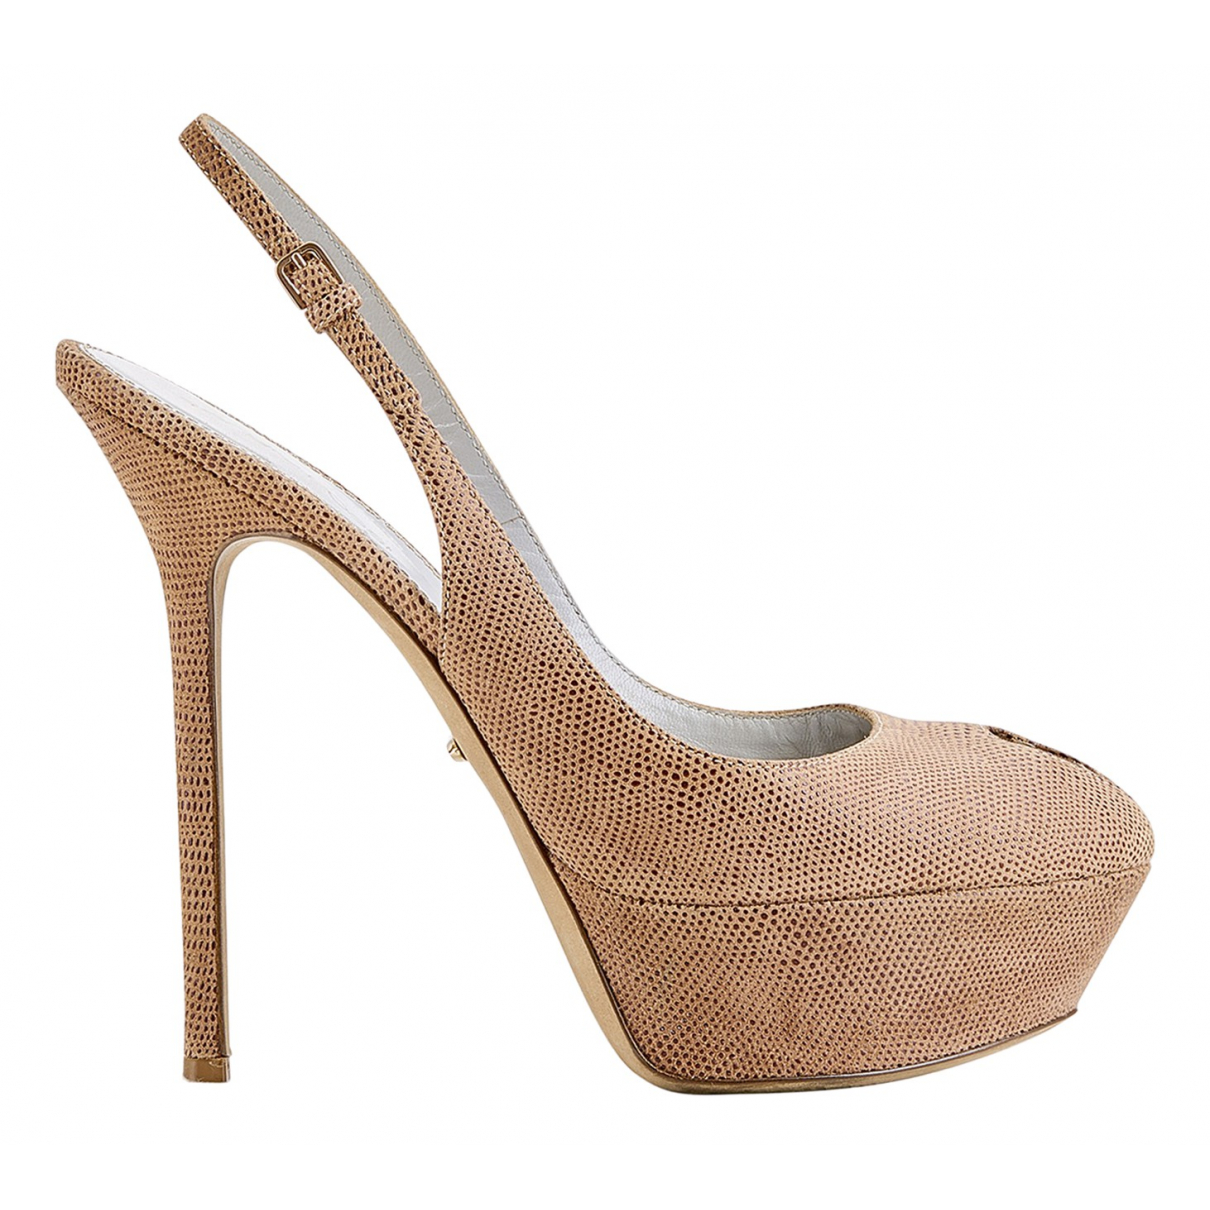 Sergio Rossi N Brown Leather Heels for Women 5 UK